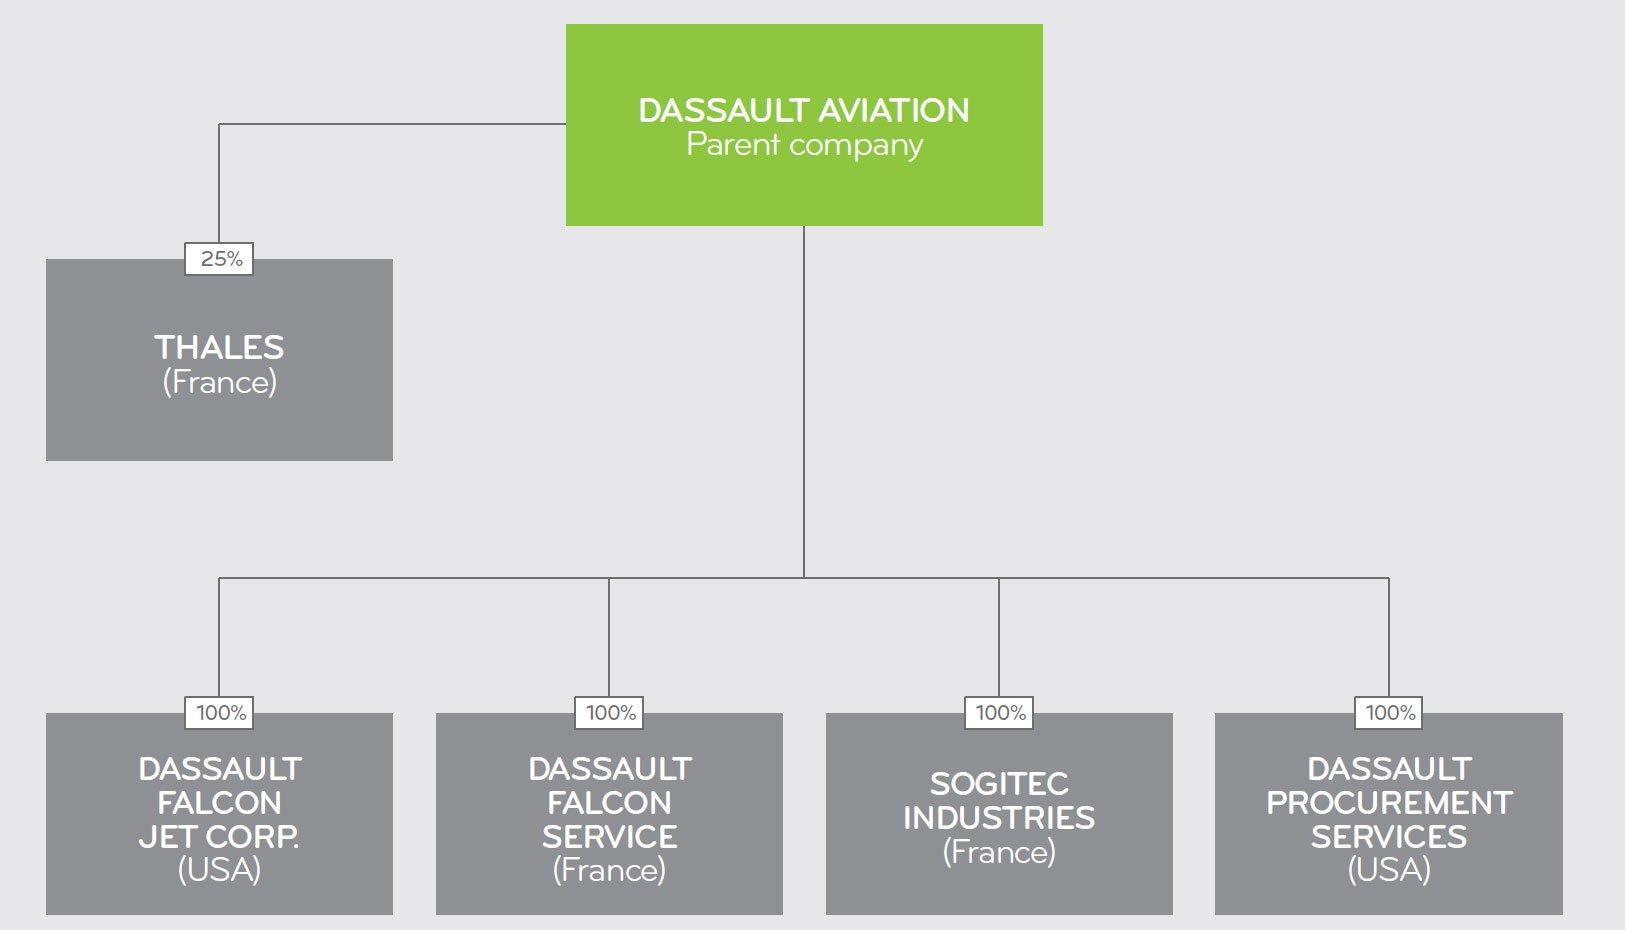 Organization chart of Dassault Aviation Group